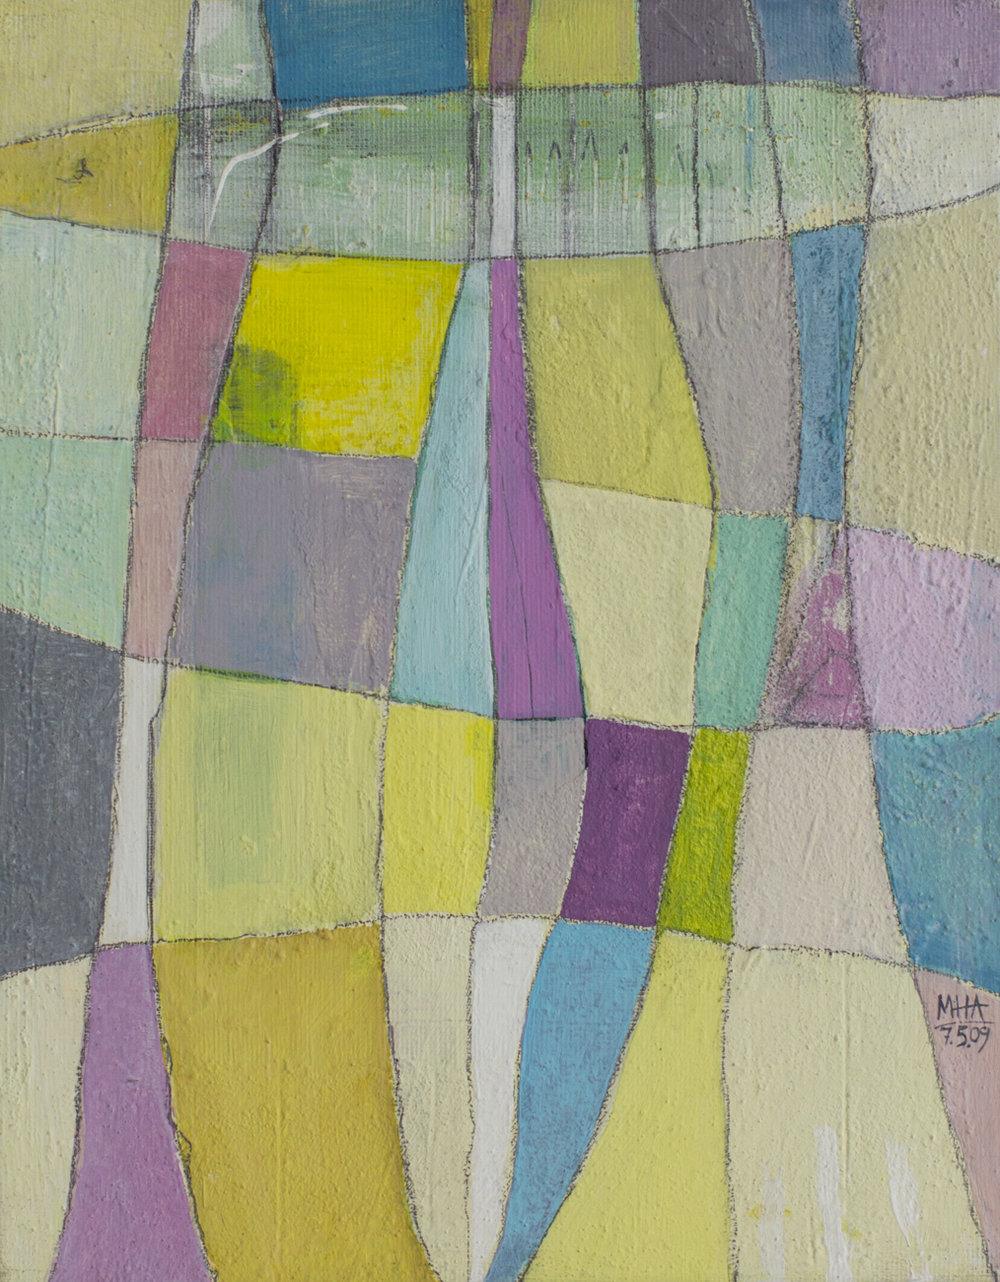 Fantasie in Linien 15 , 2009,Acryl auf Leinwand, 24x30 cm